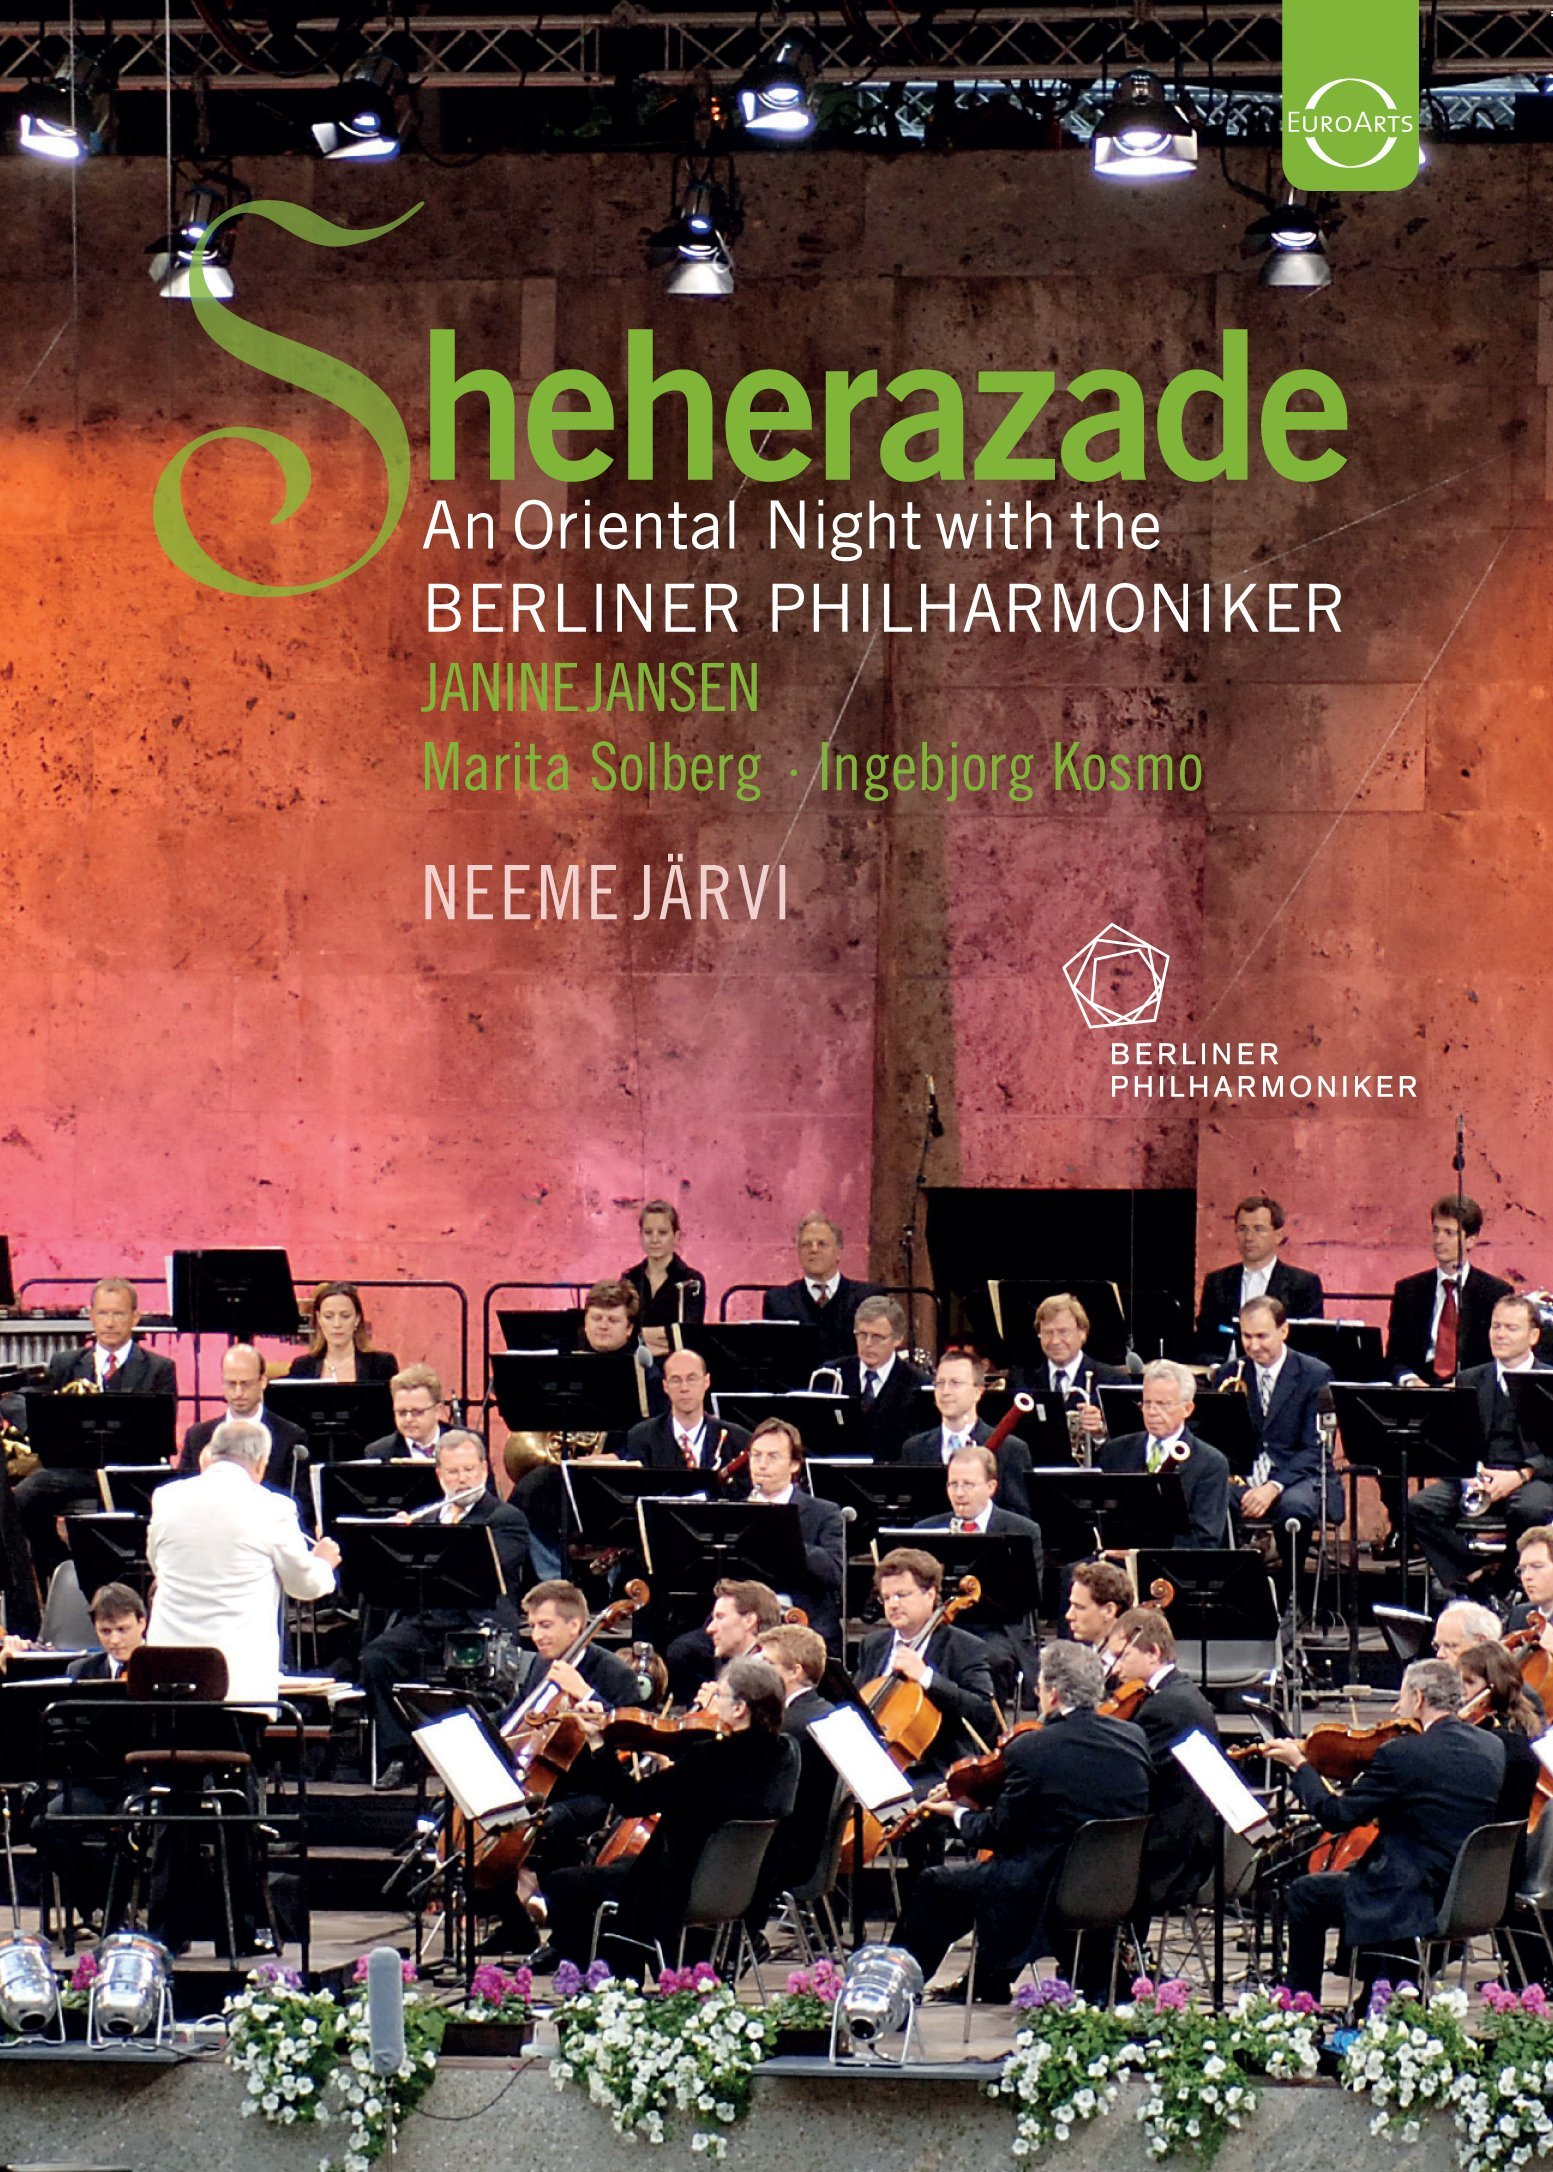 Sheherazade - An Oriental Night with the Berliner Philharmoniker - Waldbuhne Berlin by EuroArts